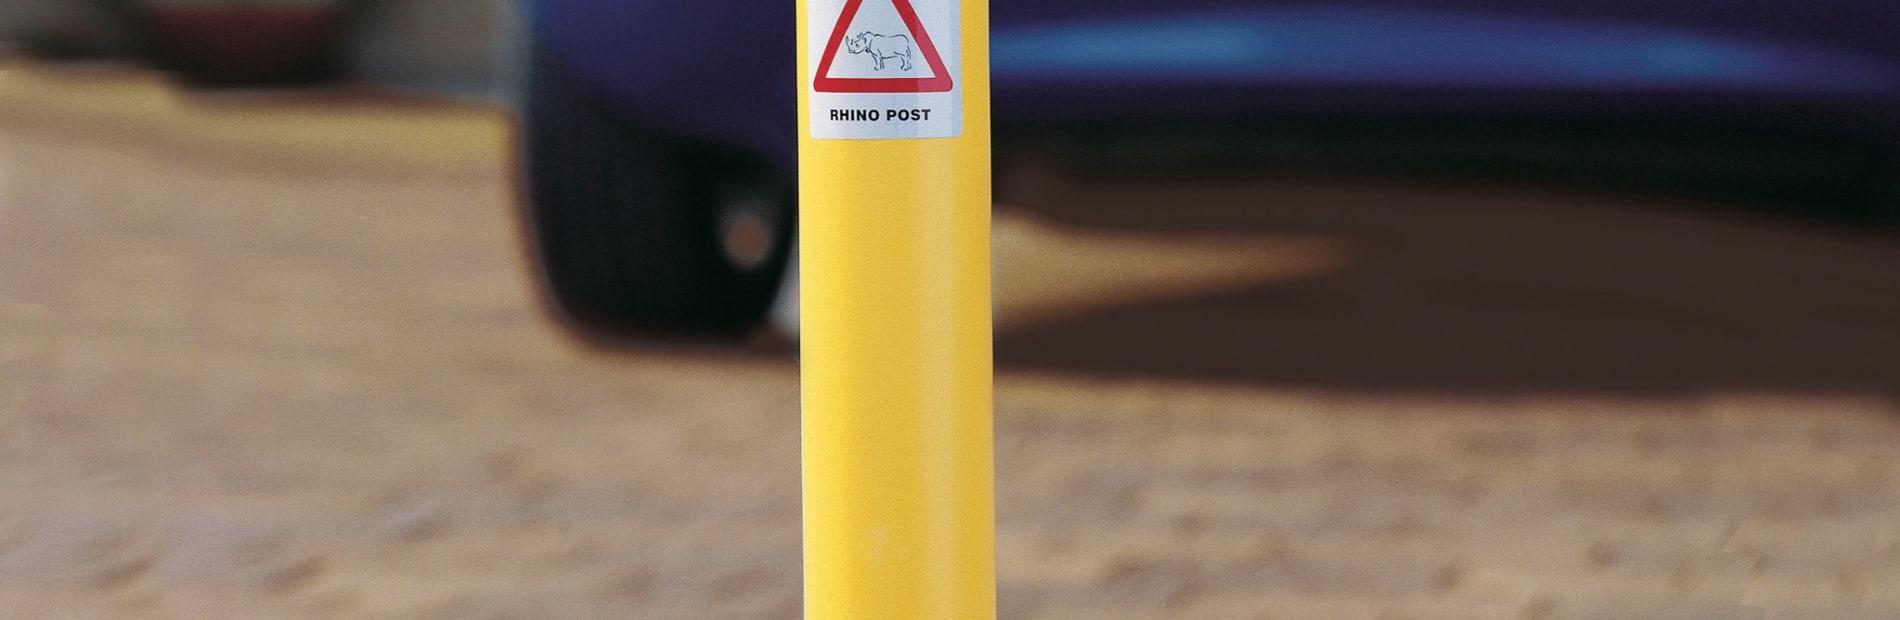 Driveway Security Post hero image